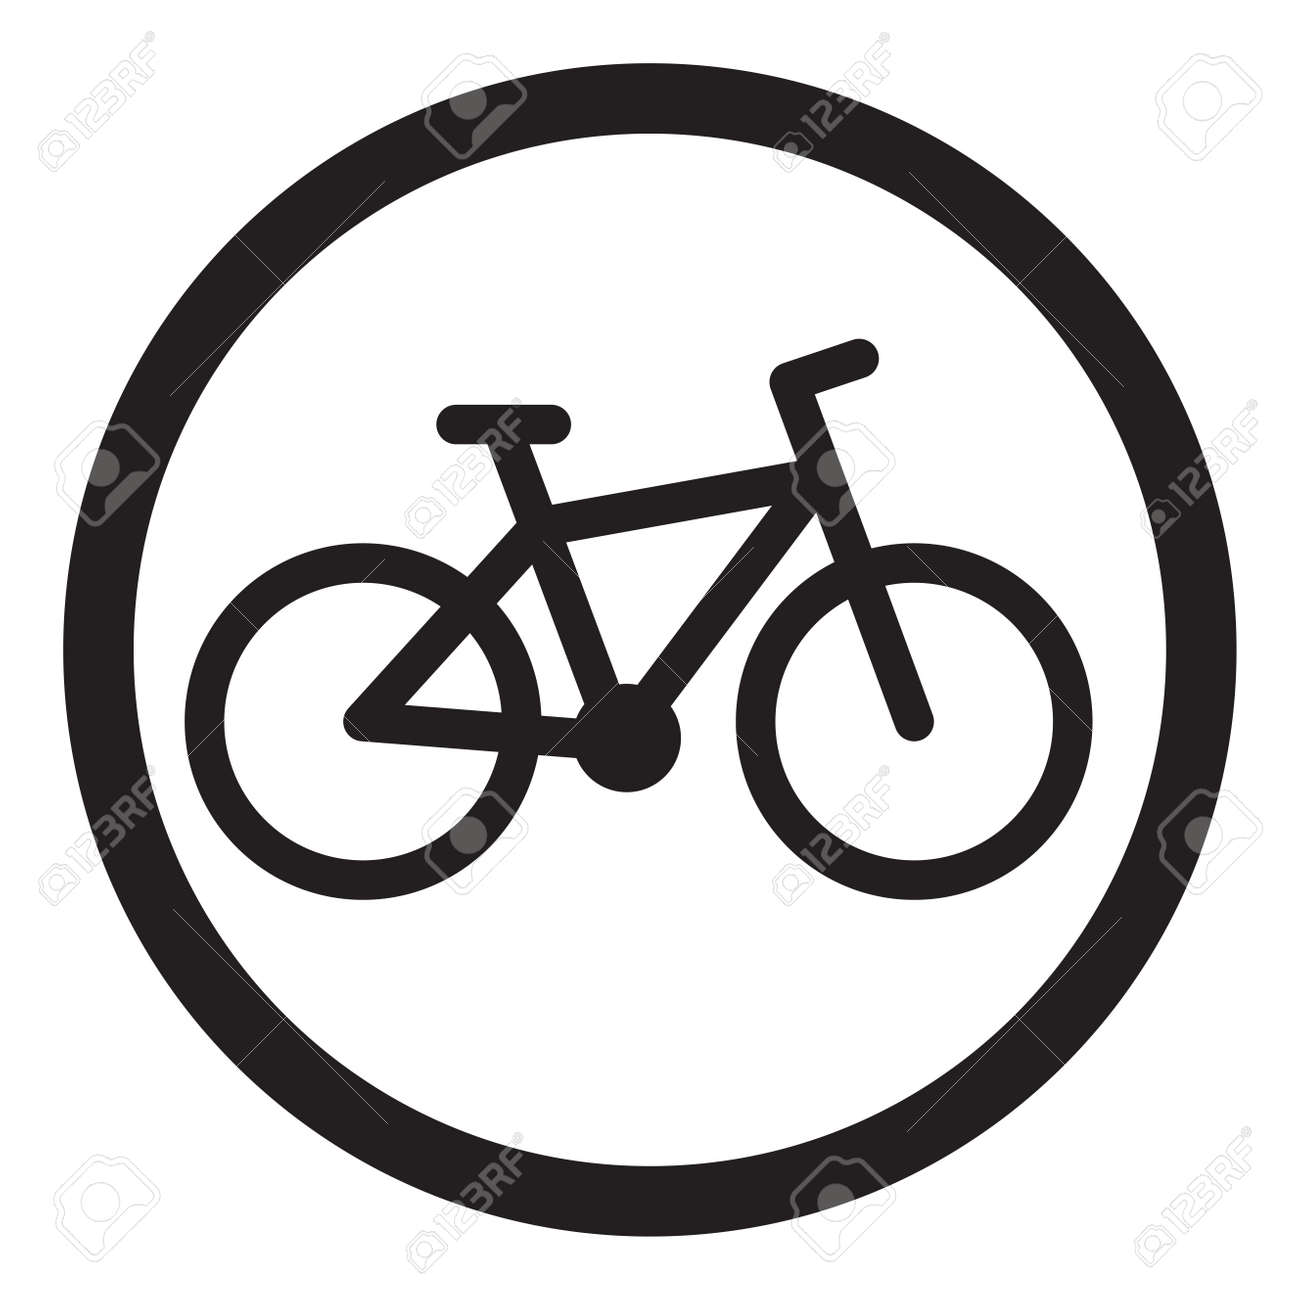 Resultado de imagen de bicicleta logo